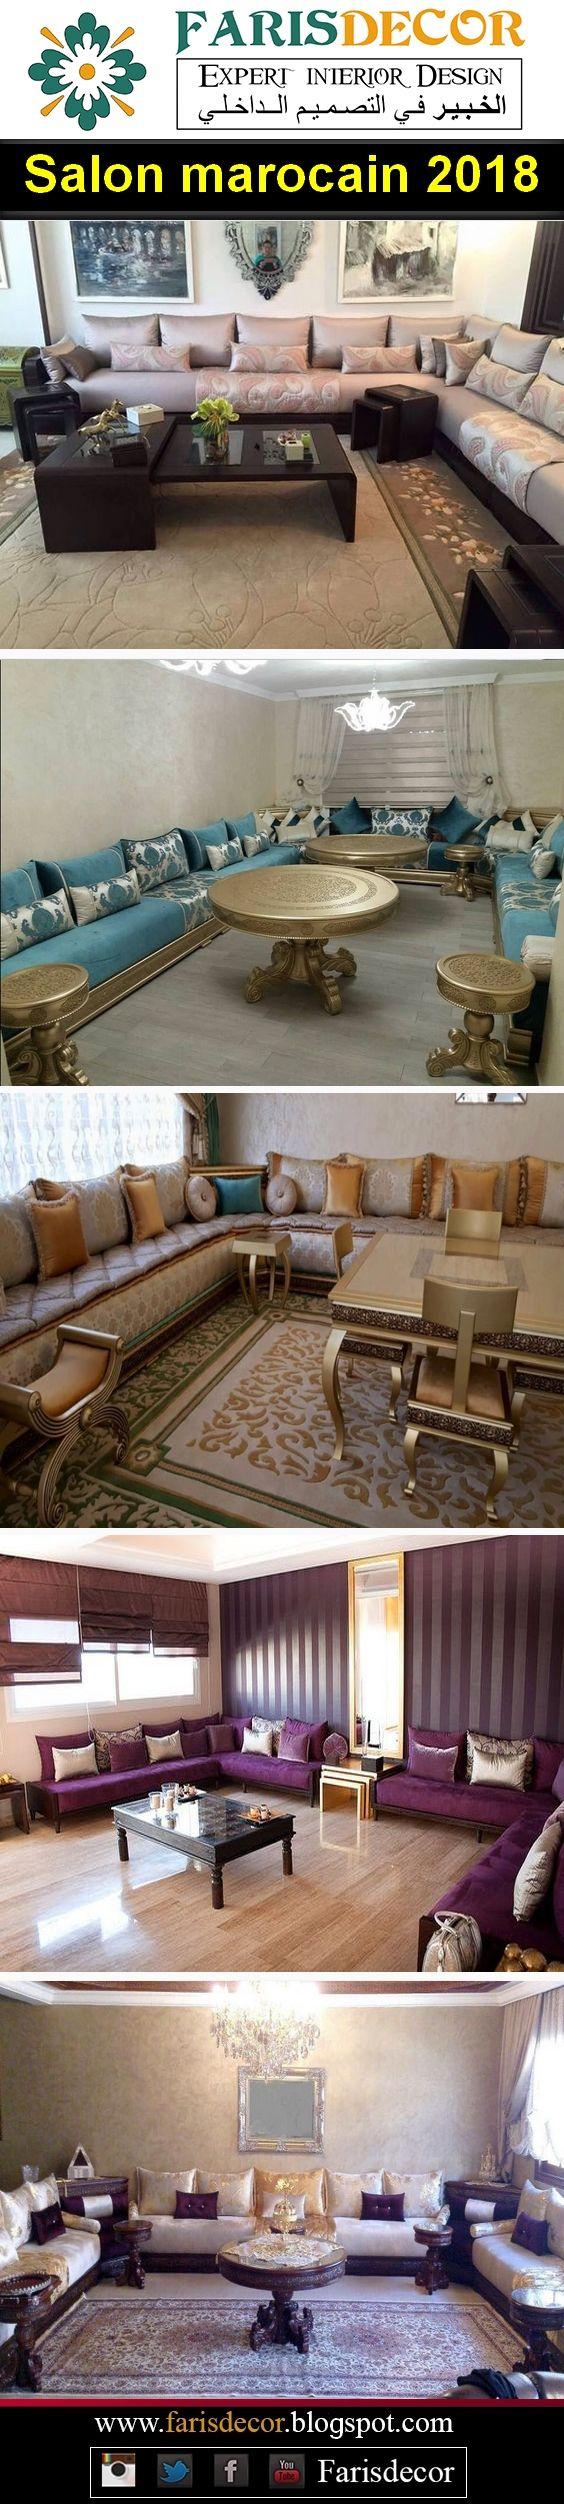 Salon Marocain 2018 Living Room Expert Decorator Decoration